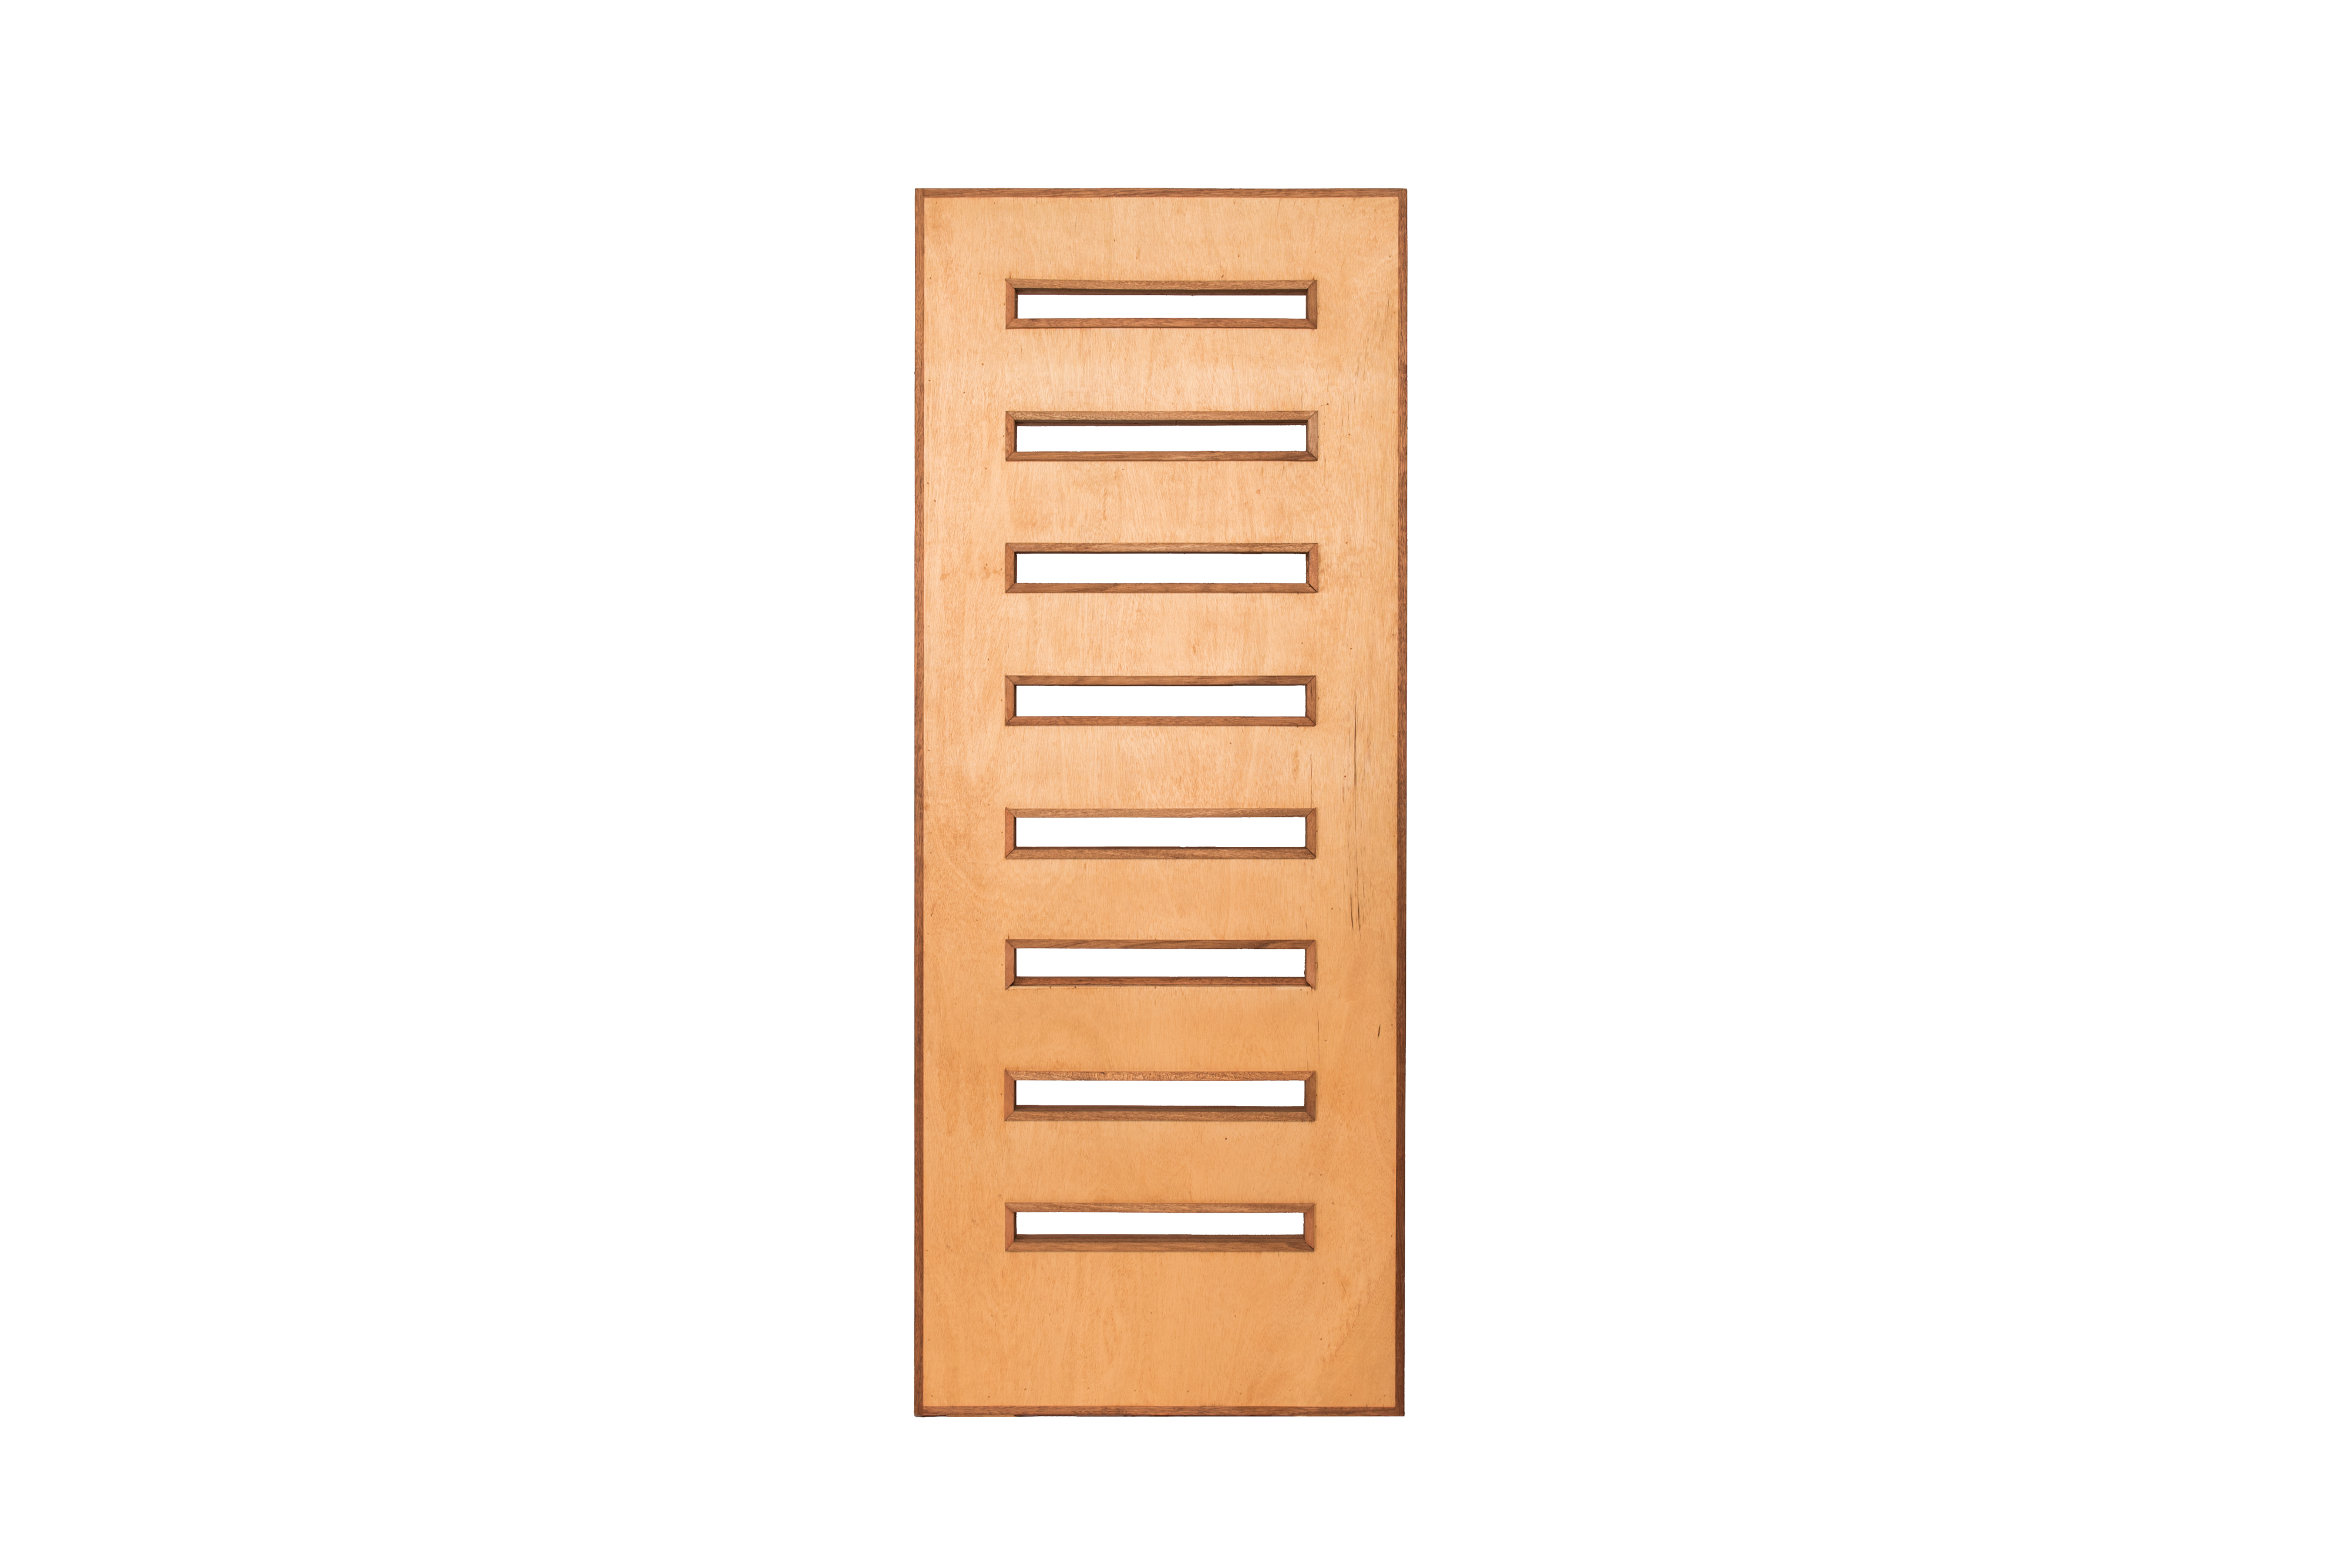 8 LIGHT MARINE PLY DOOR  sc 1 st  Mega Doors & 8 Light Horizontal Marine Ply Glass Entrance Door | Mega Doors